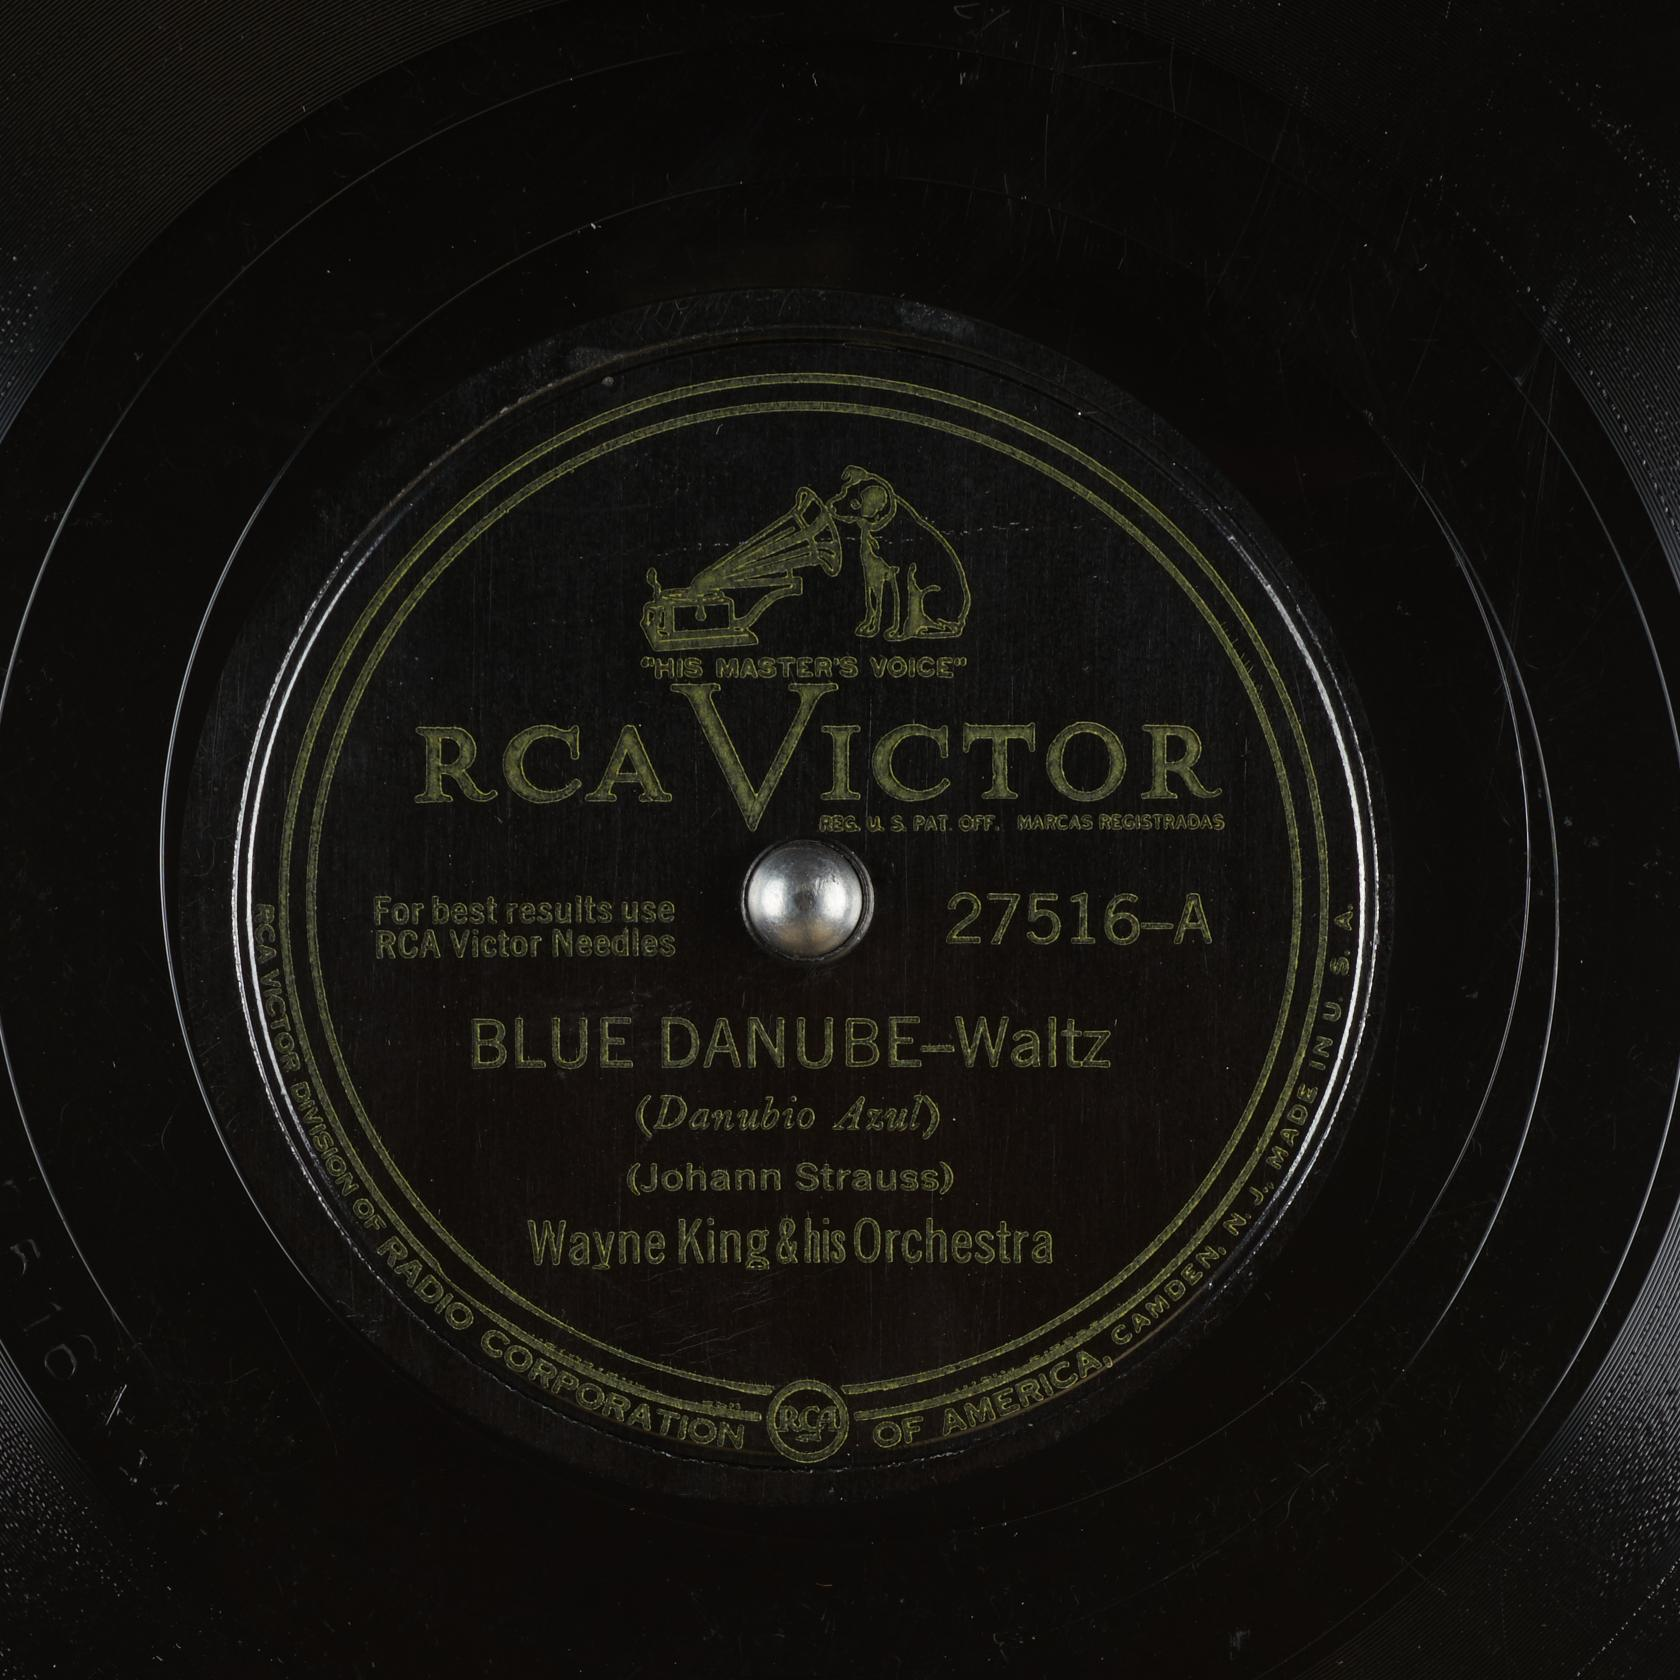 Blue Danube Danubio Azul Wayne King His Orchestra Free Download Borrow And Streaming Internet Archive